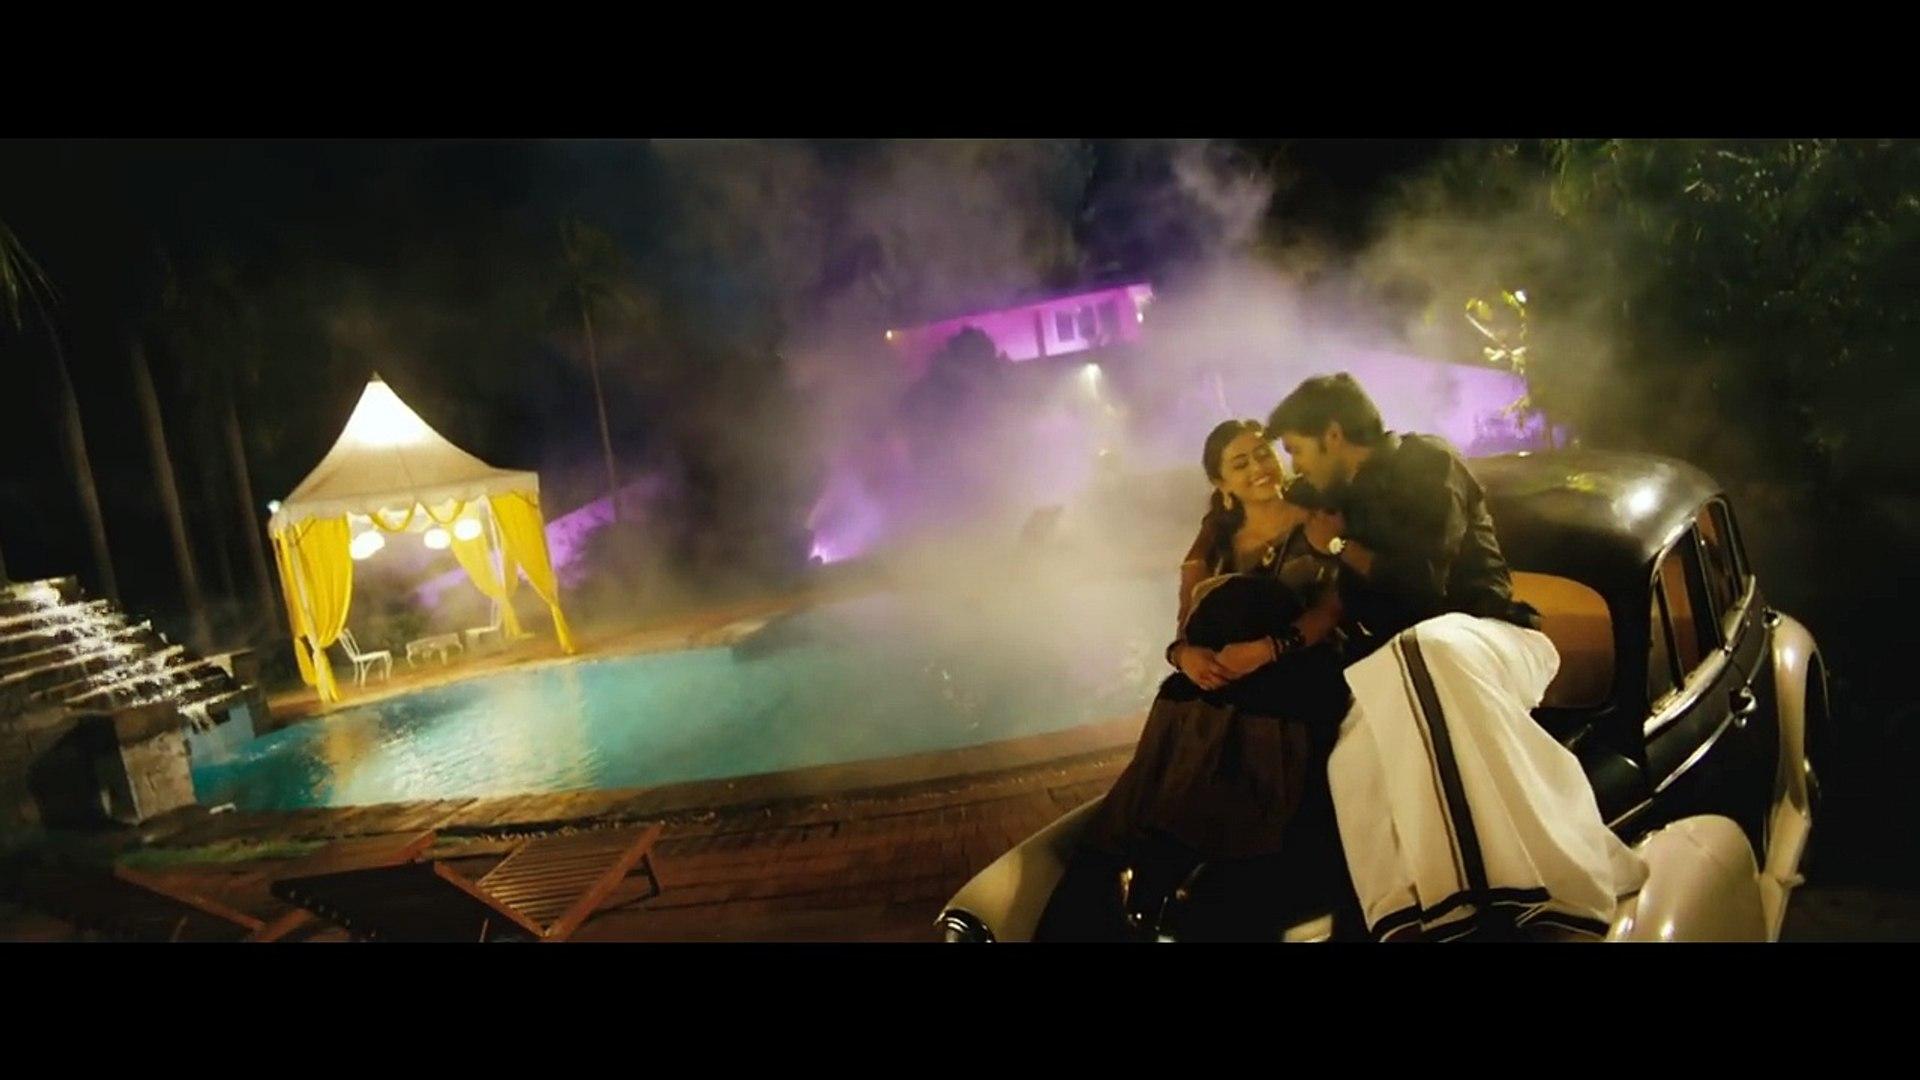 Tamil Whatsapp Status Vellakkara Durai Koodha Kaathu Best Love Cut Song Lyrics Video Dailymotion